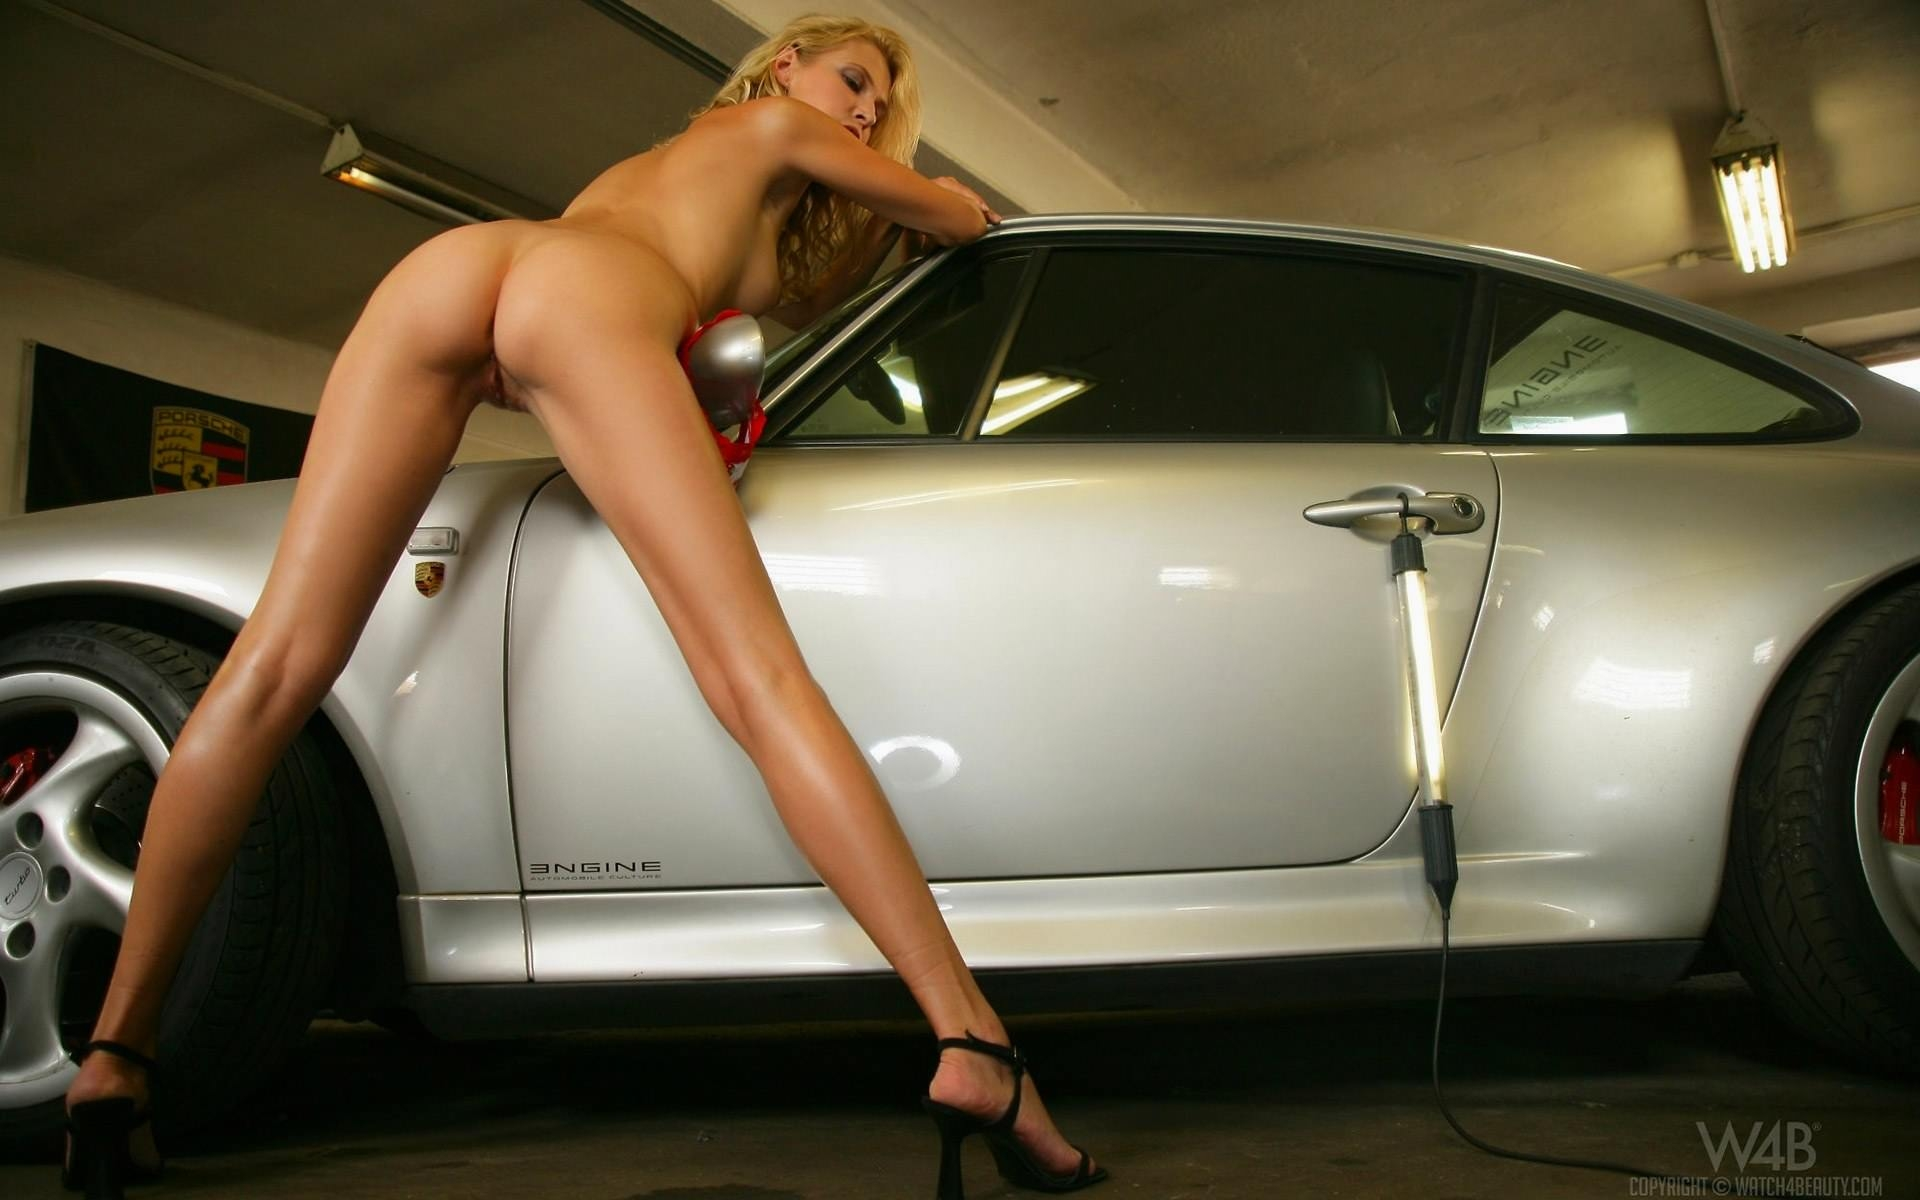 Фото голой девушки на авто 12 фотография